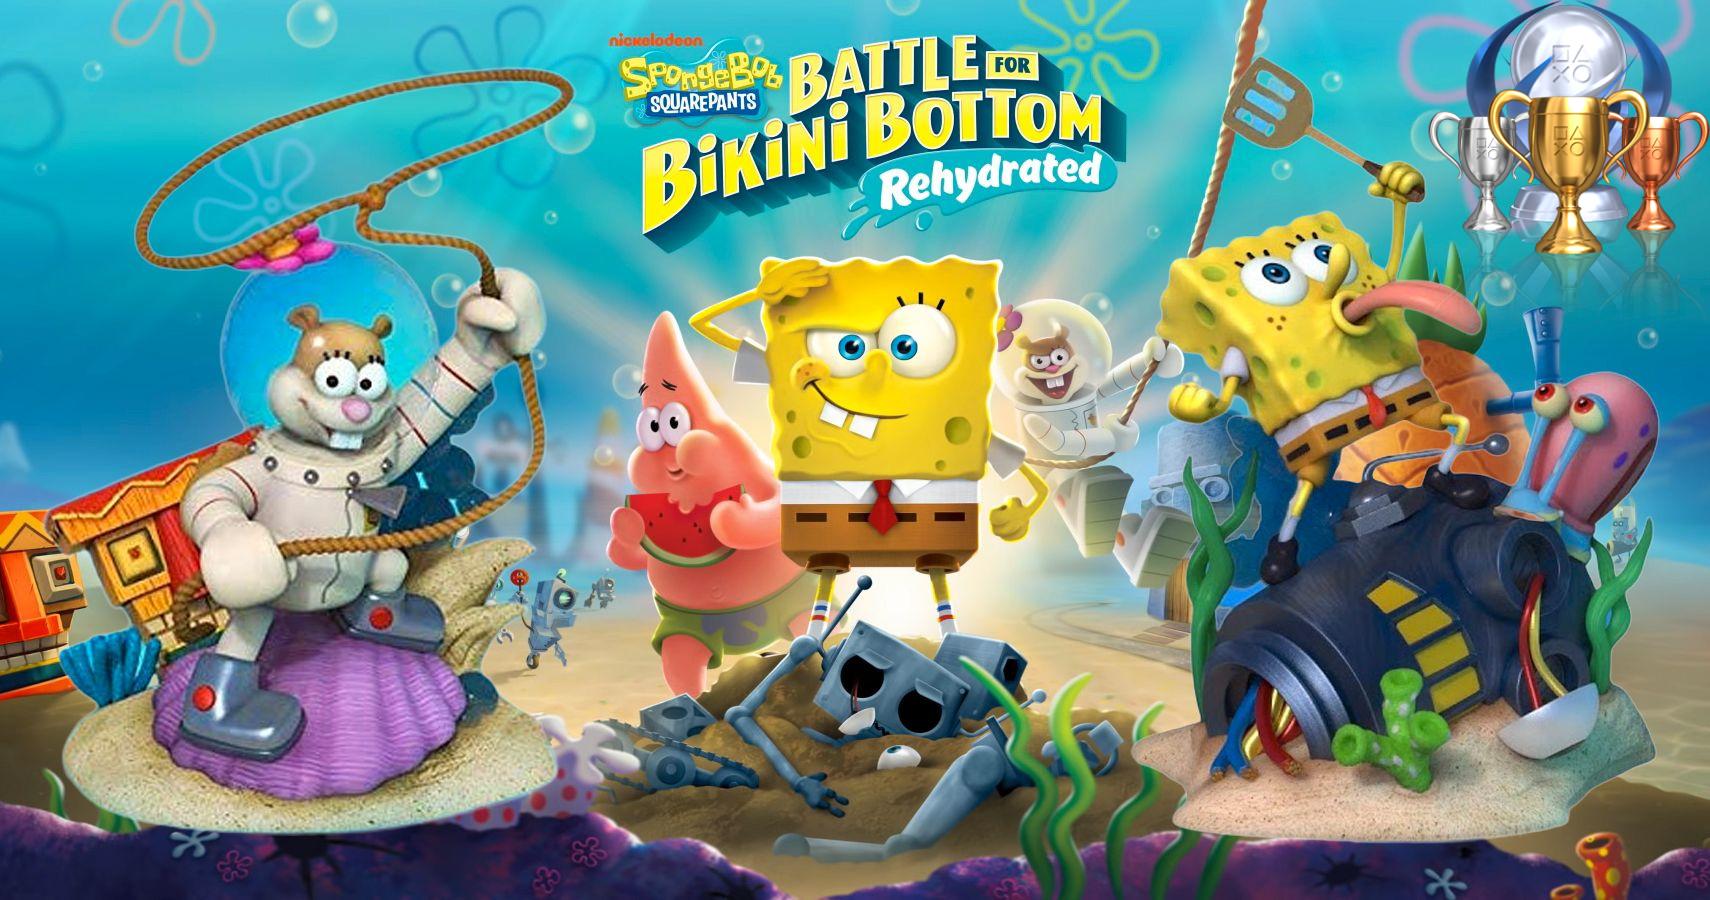 SpongeBob-SquarePants-Battle-For-Bikini-Bottom-Rehydrated-Collectors-Edition (1)